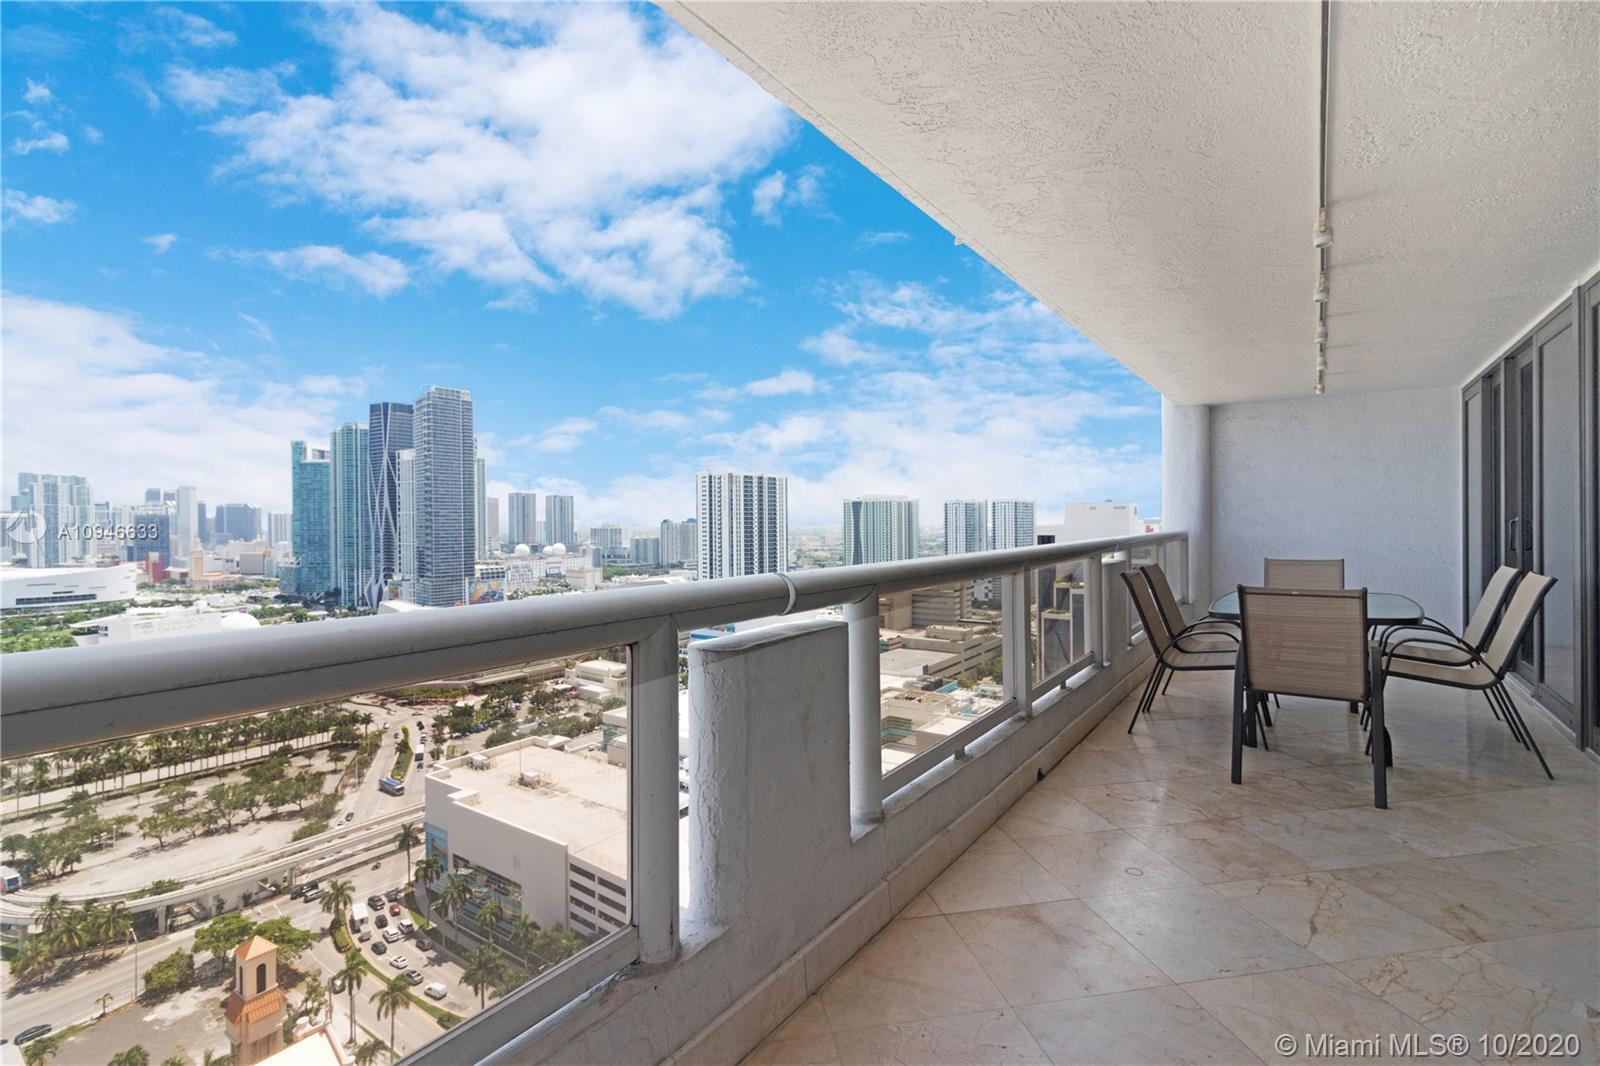 1717 N Bayshore Dr # 3556, Miami, Florida 33132, 4 Bedrooms Bedrooms, ,3 BathroomsBathrooms,Residential,For Sale,1717 N Bayshore Dr # 3556,A10946633